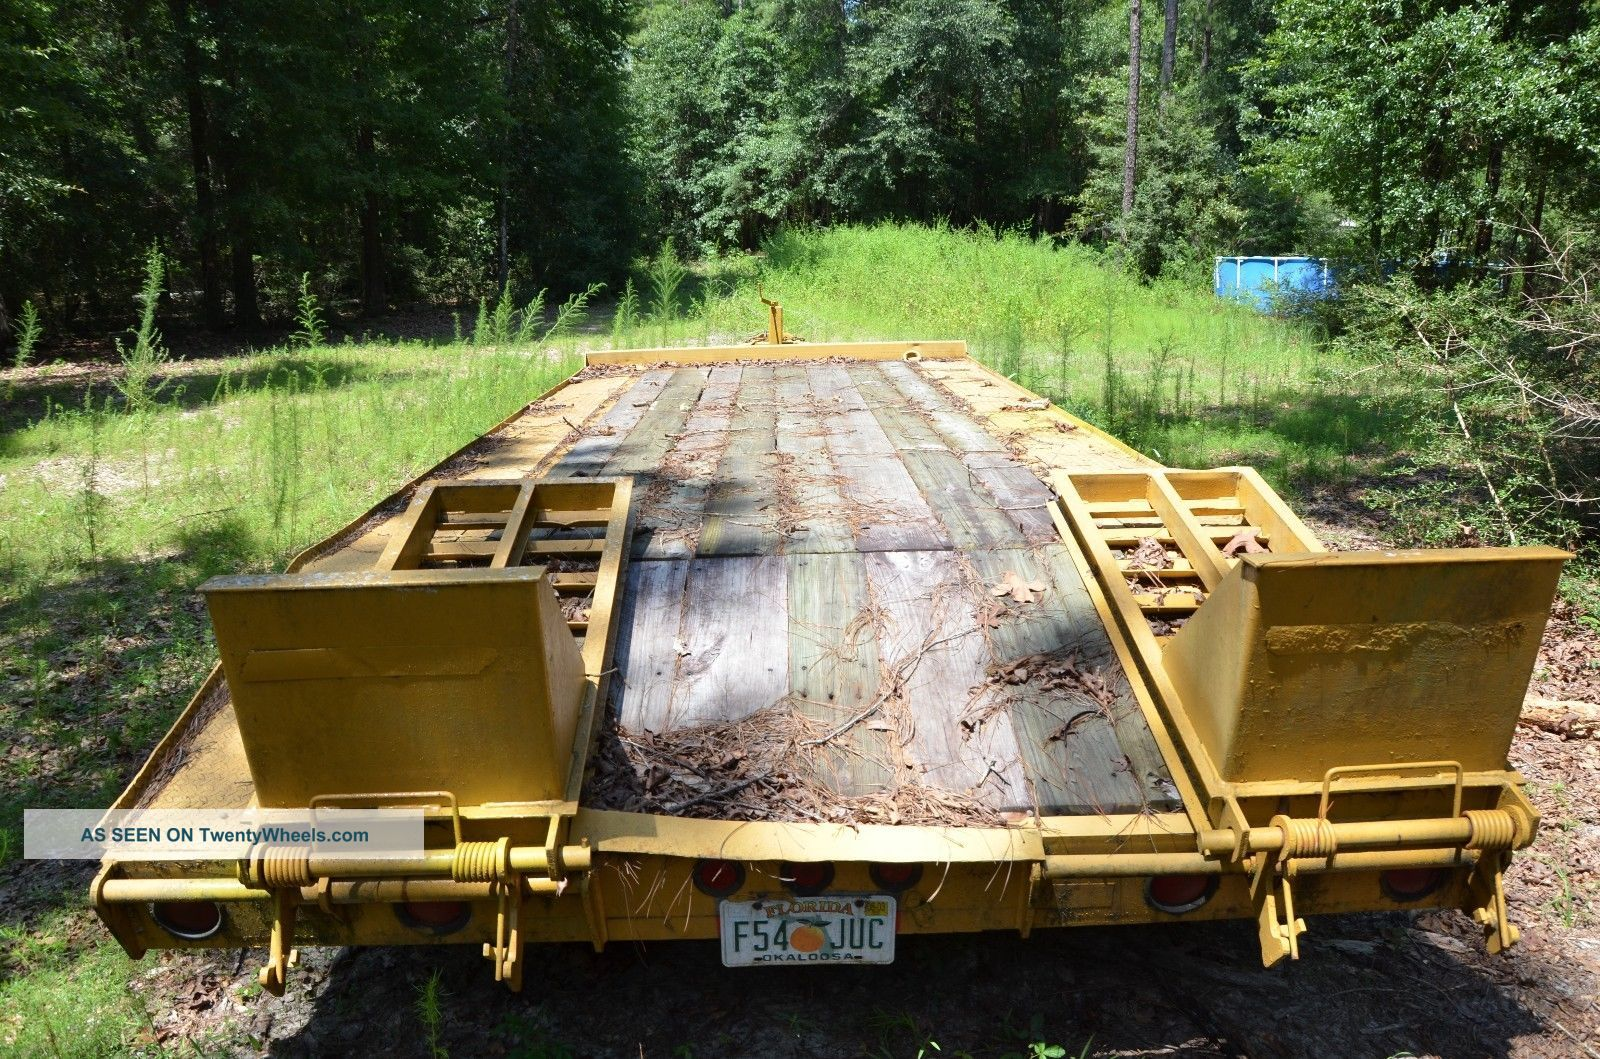 Case 1845c Specs >> Interstate Flatbed Trailer 9 Ton 16. 5 ' Deck